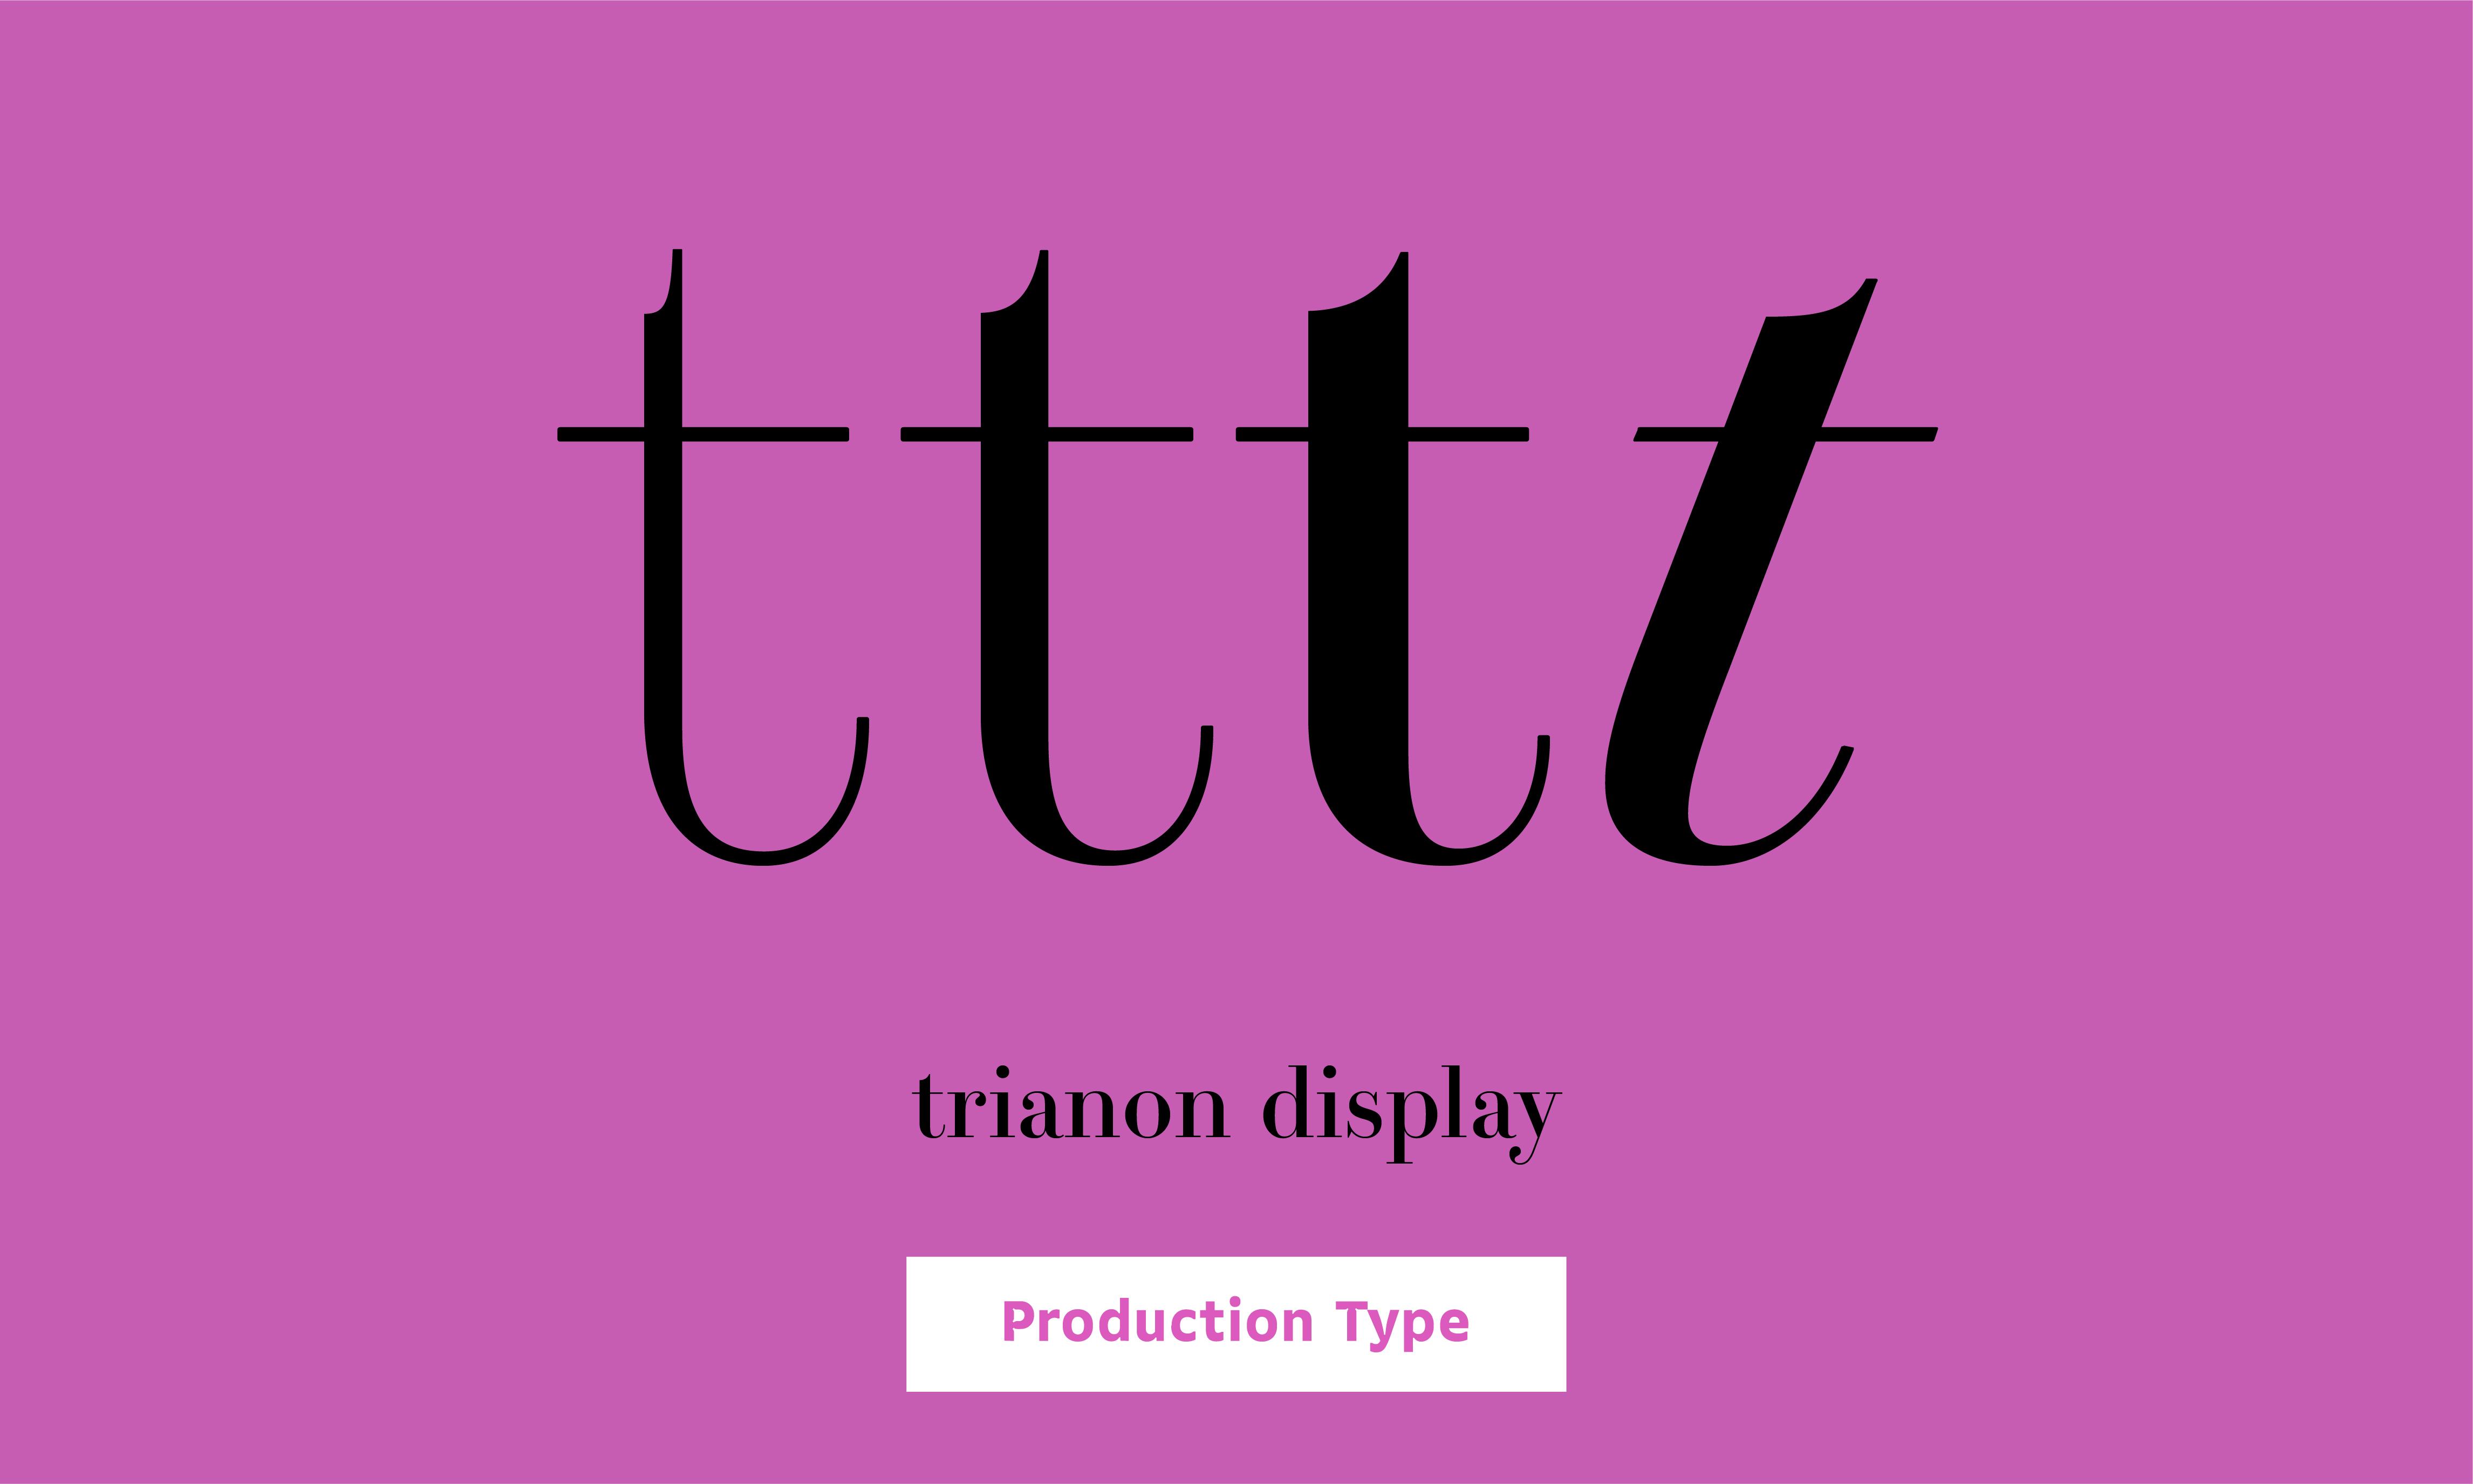 trianon_display 메인